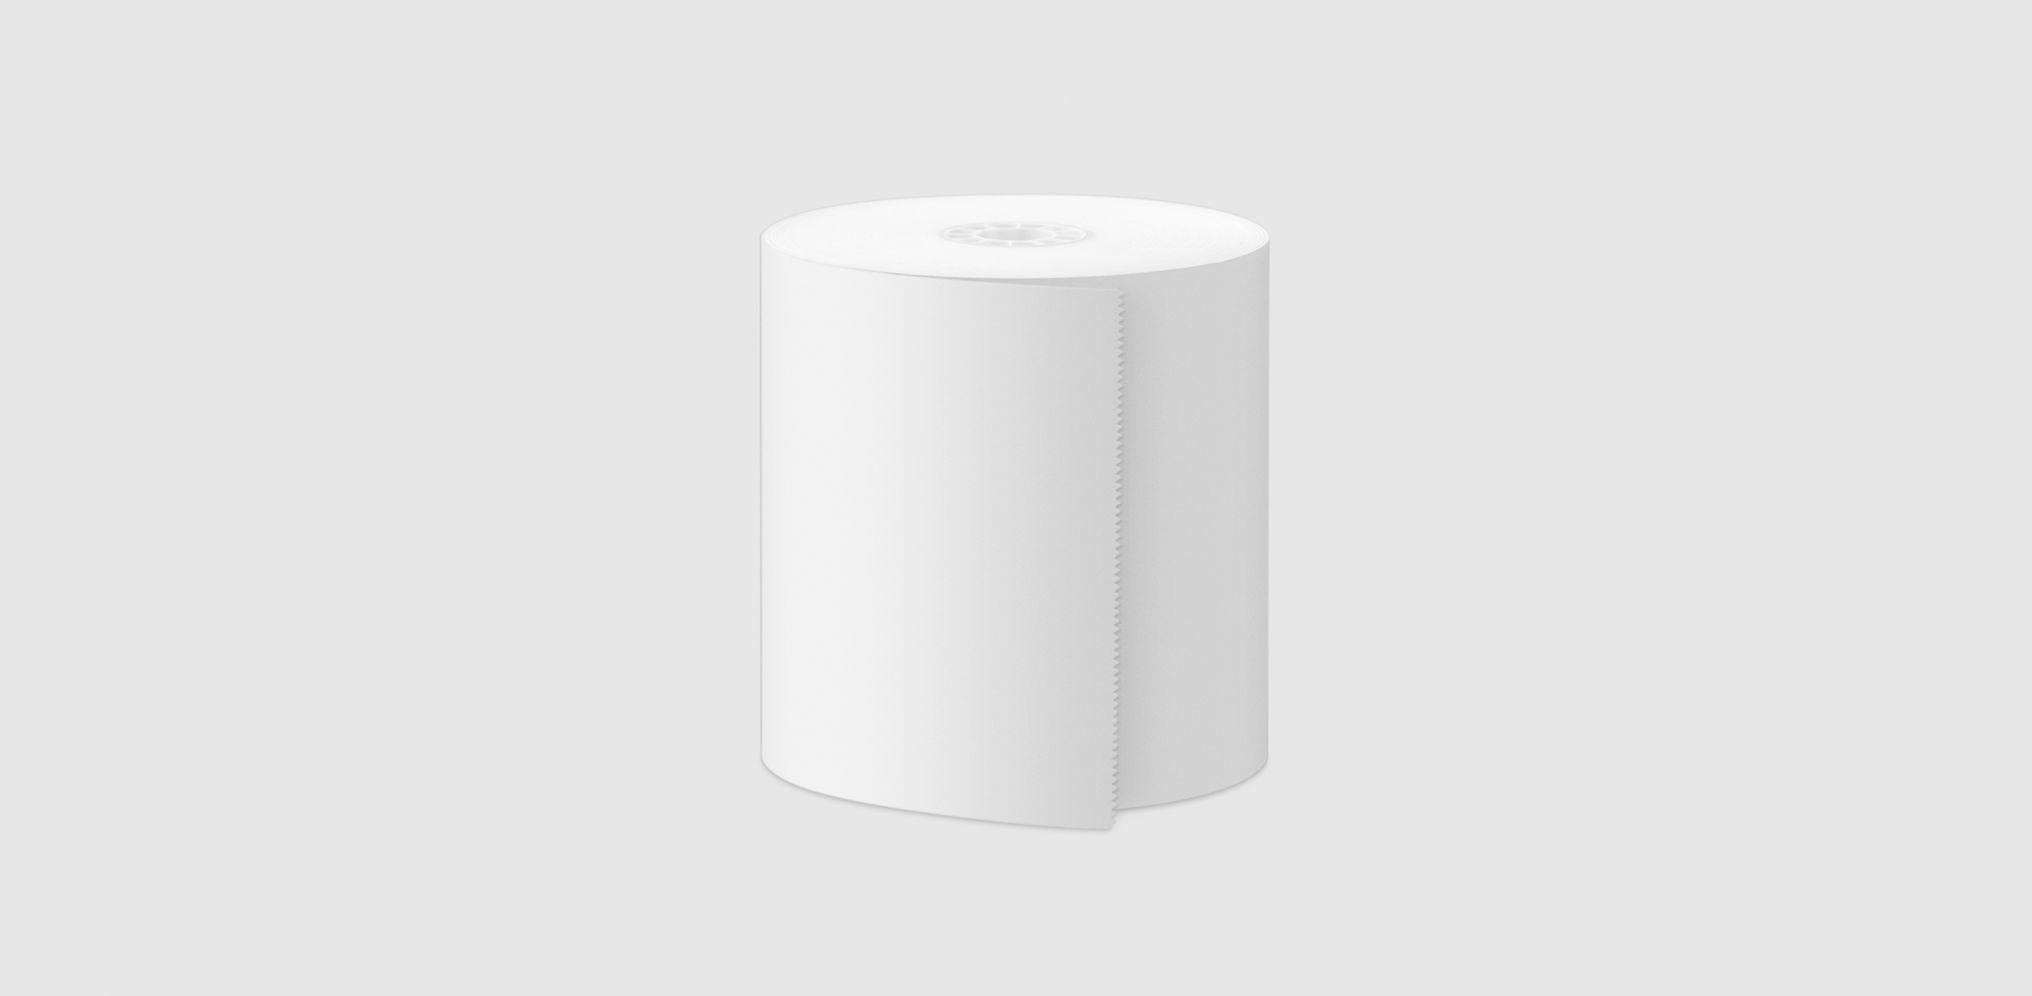 Square Terminal Printer Paper – 20 rolls | Square Shop